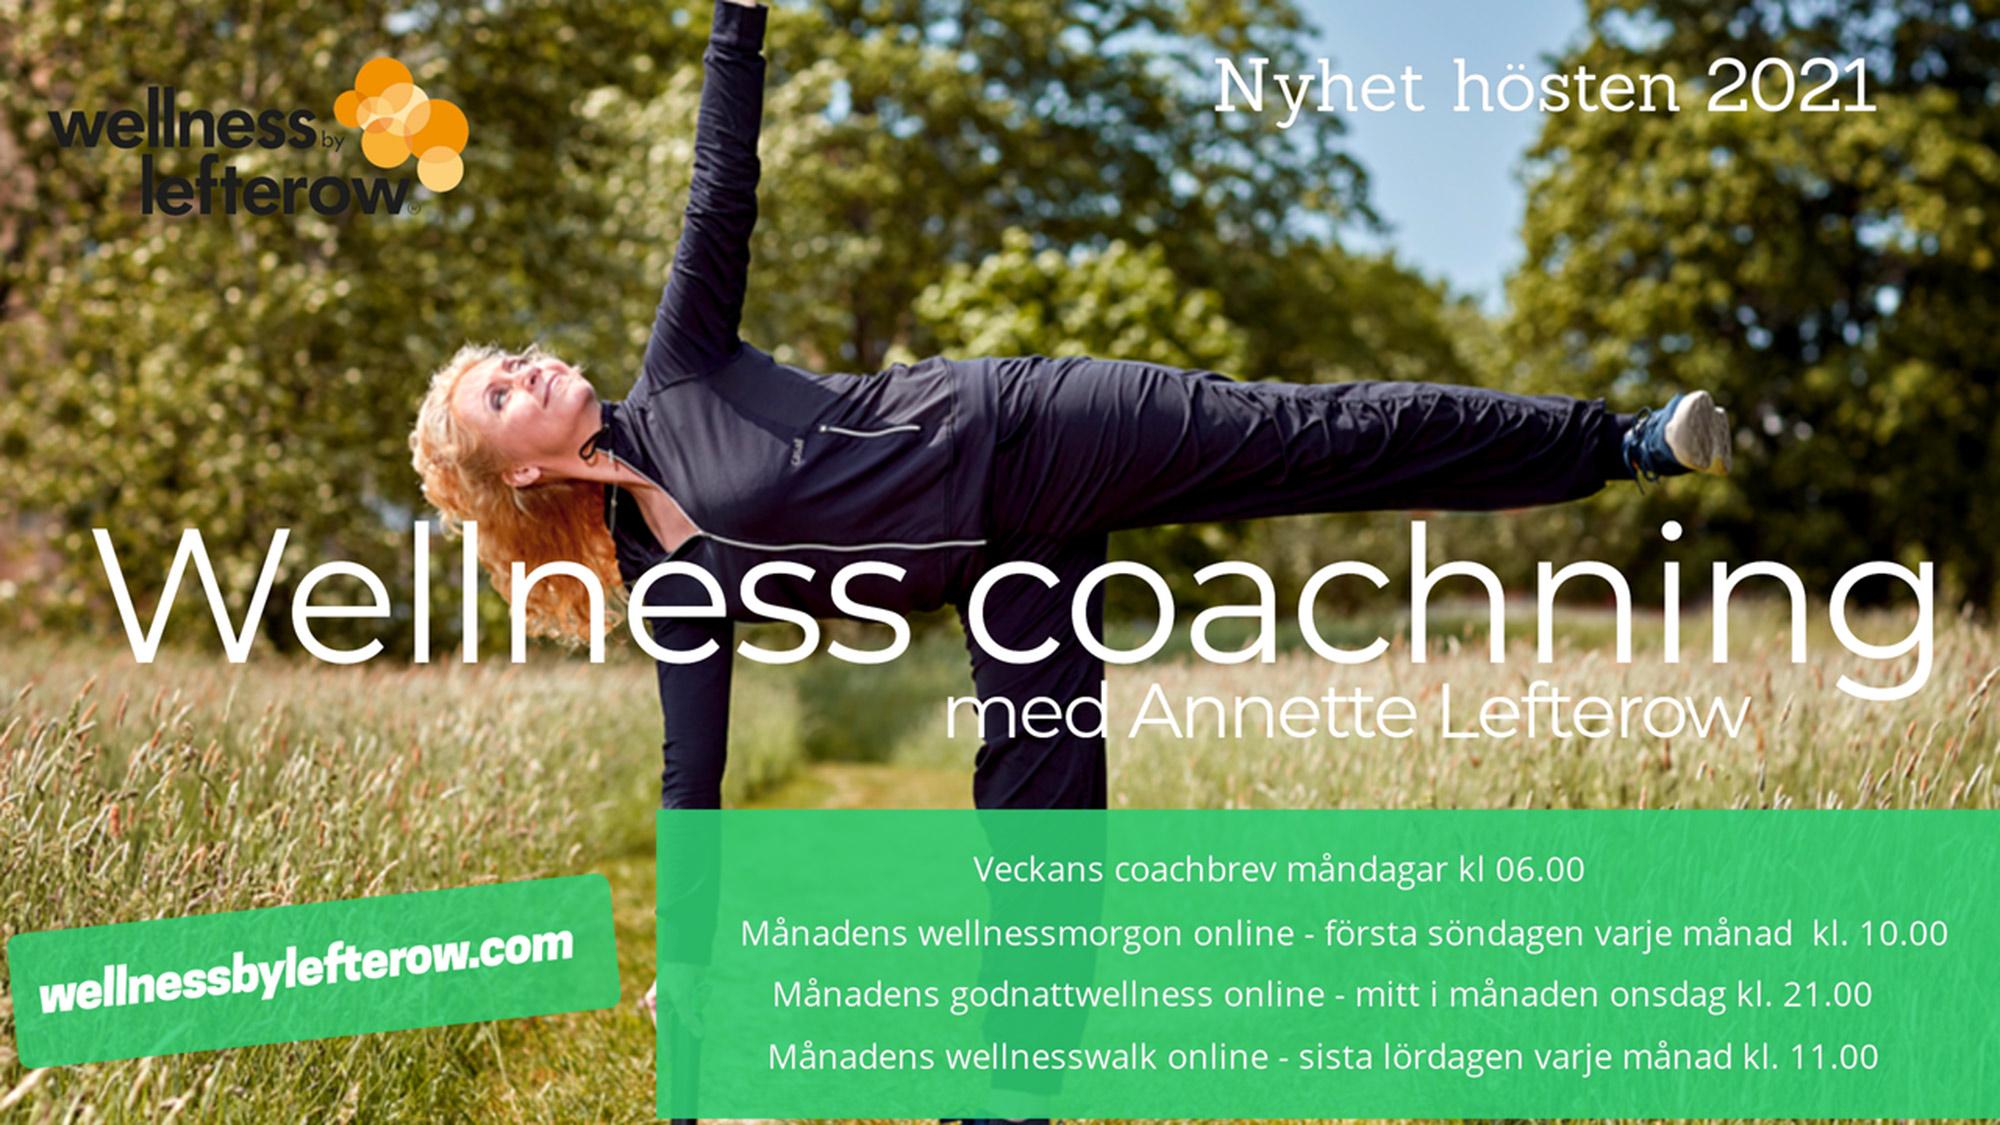 Bilden visar höstens utbud av wellness coachning med Annette Lefterow